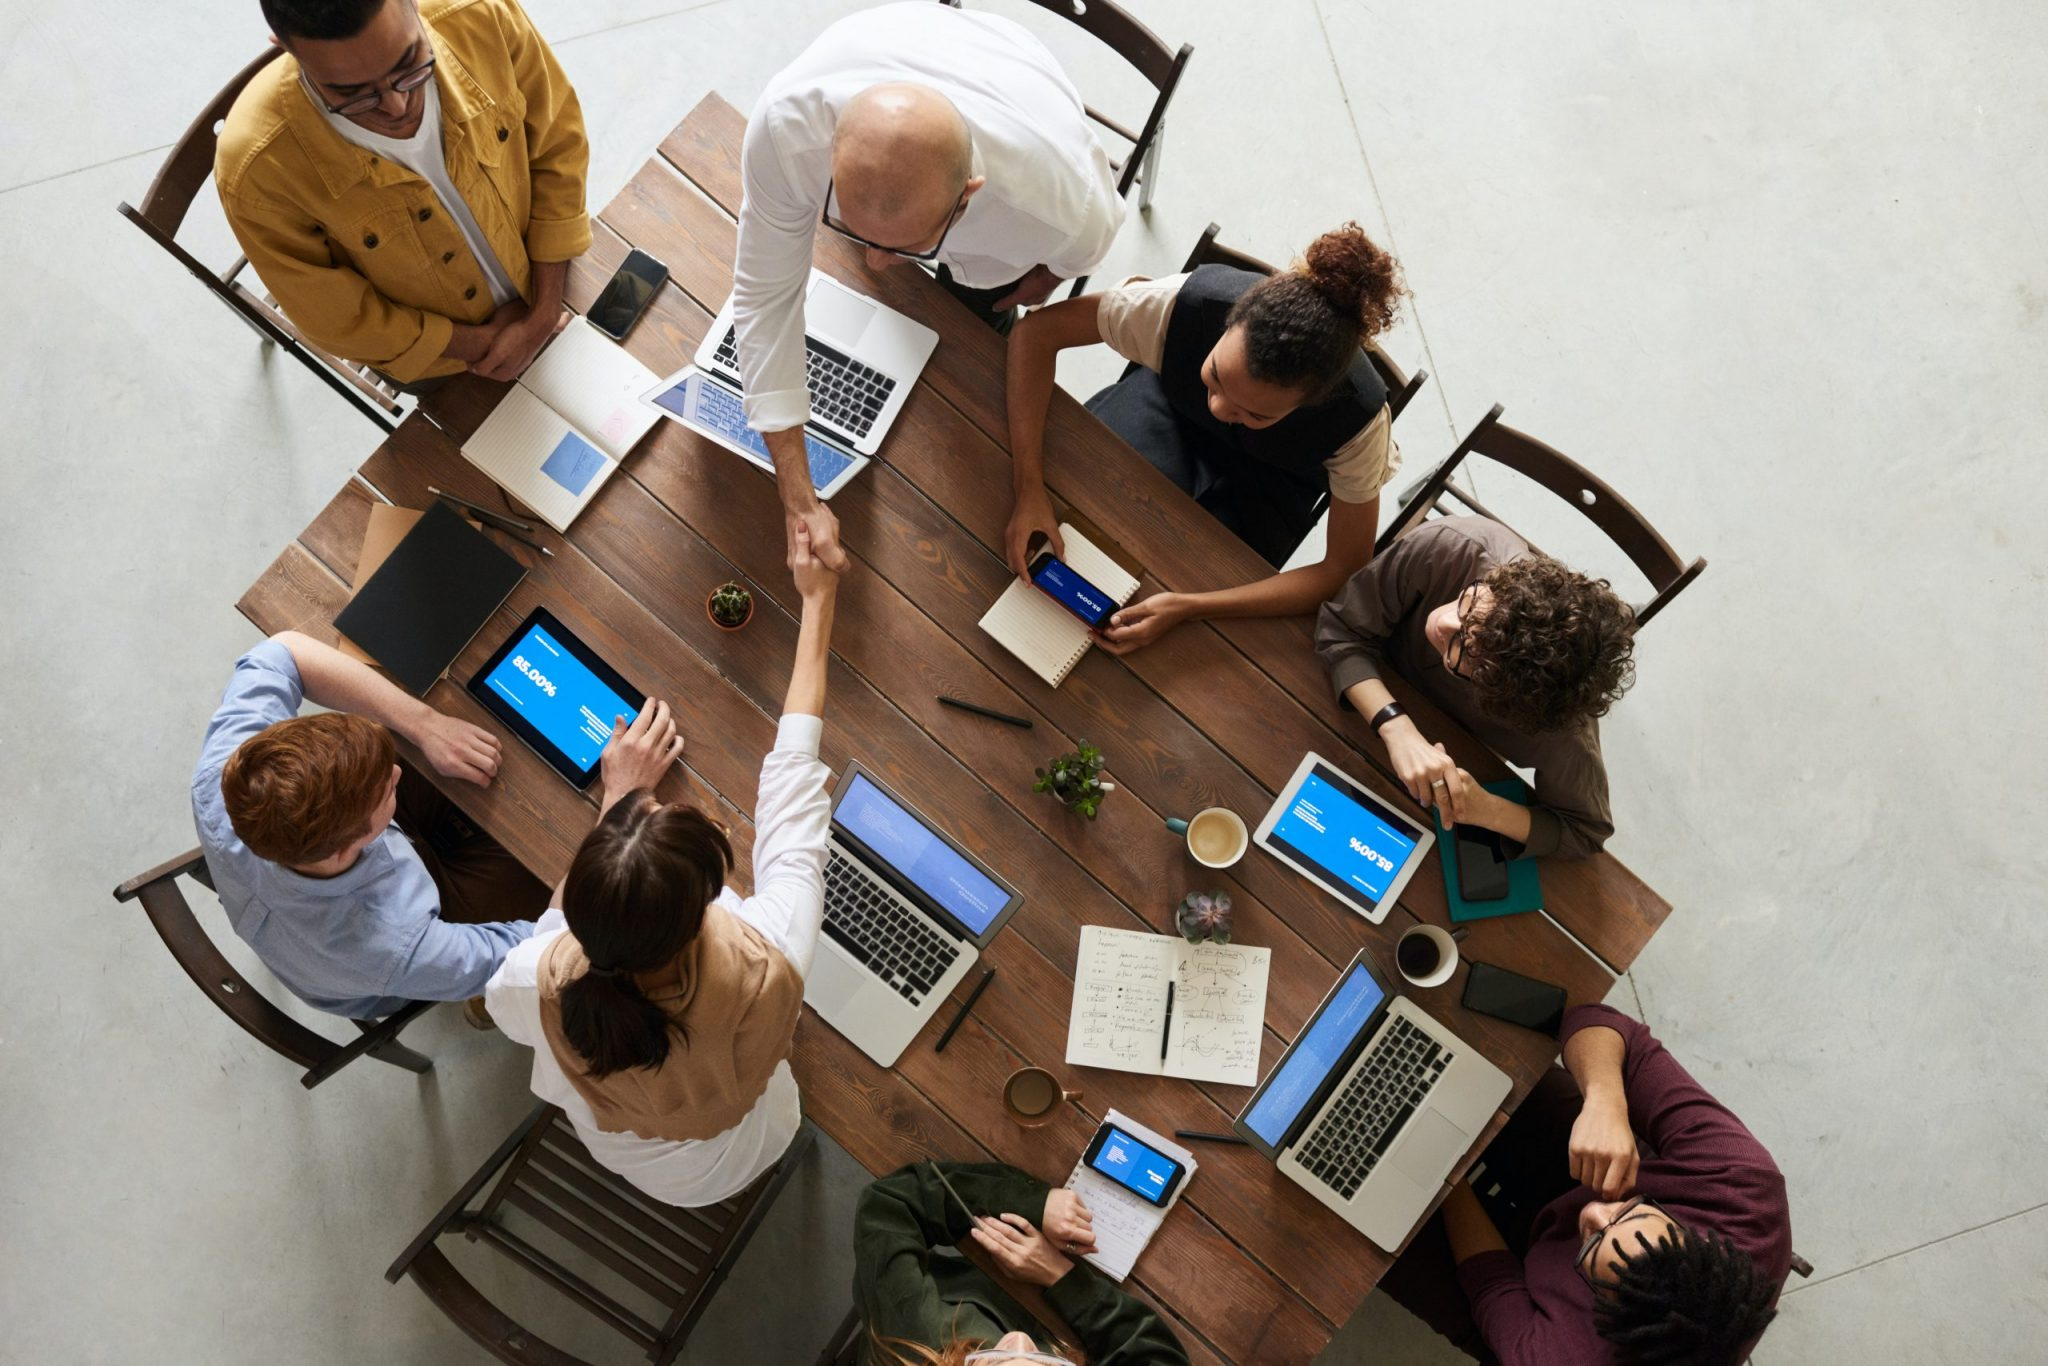 Improve your company culture